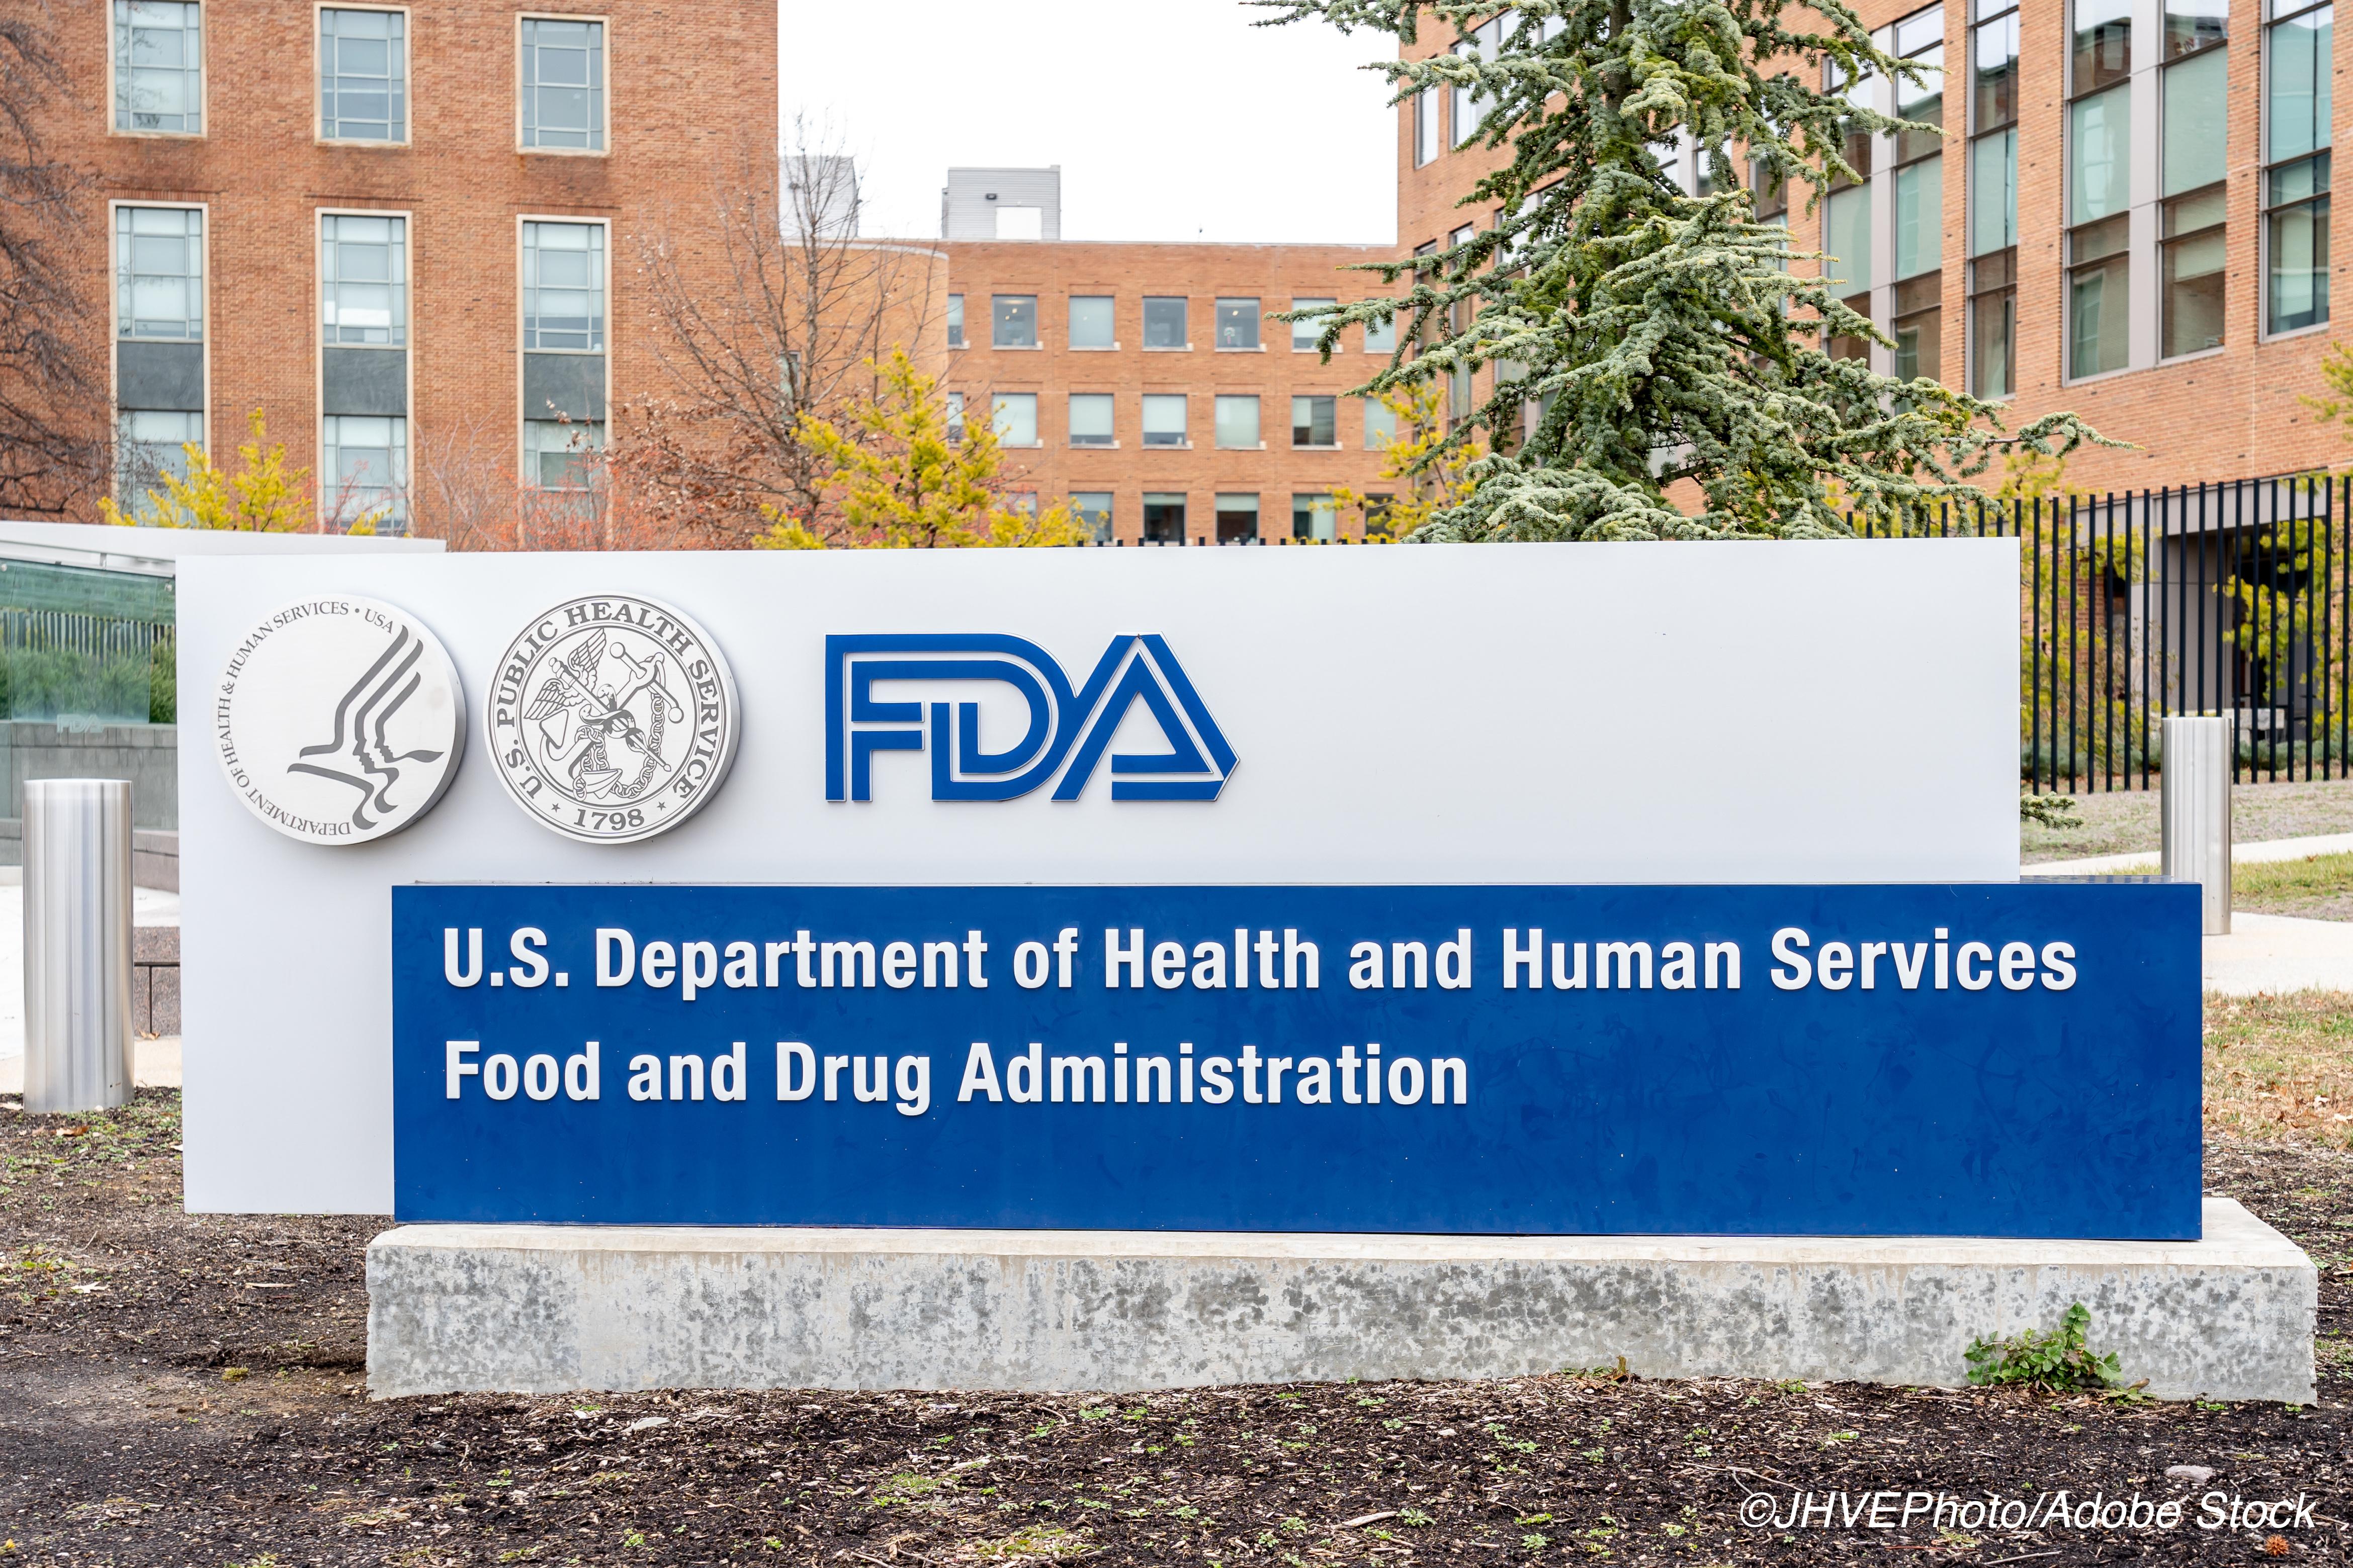 Covid-19: FDA Issues EUA for Regeneron's Monoclonal Antibody Tx